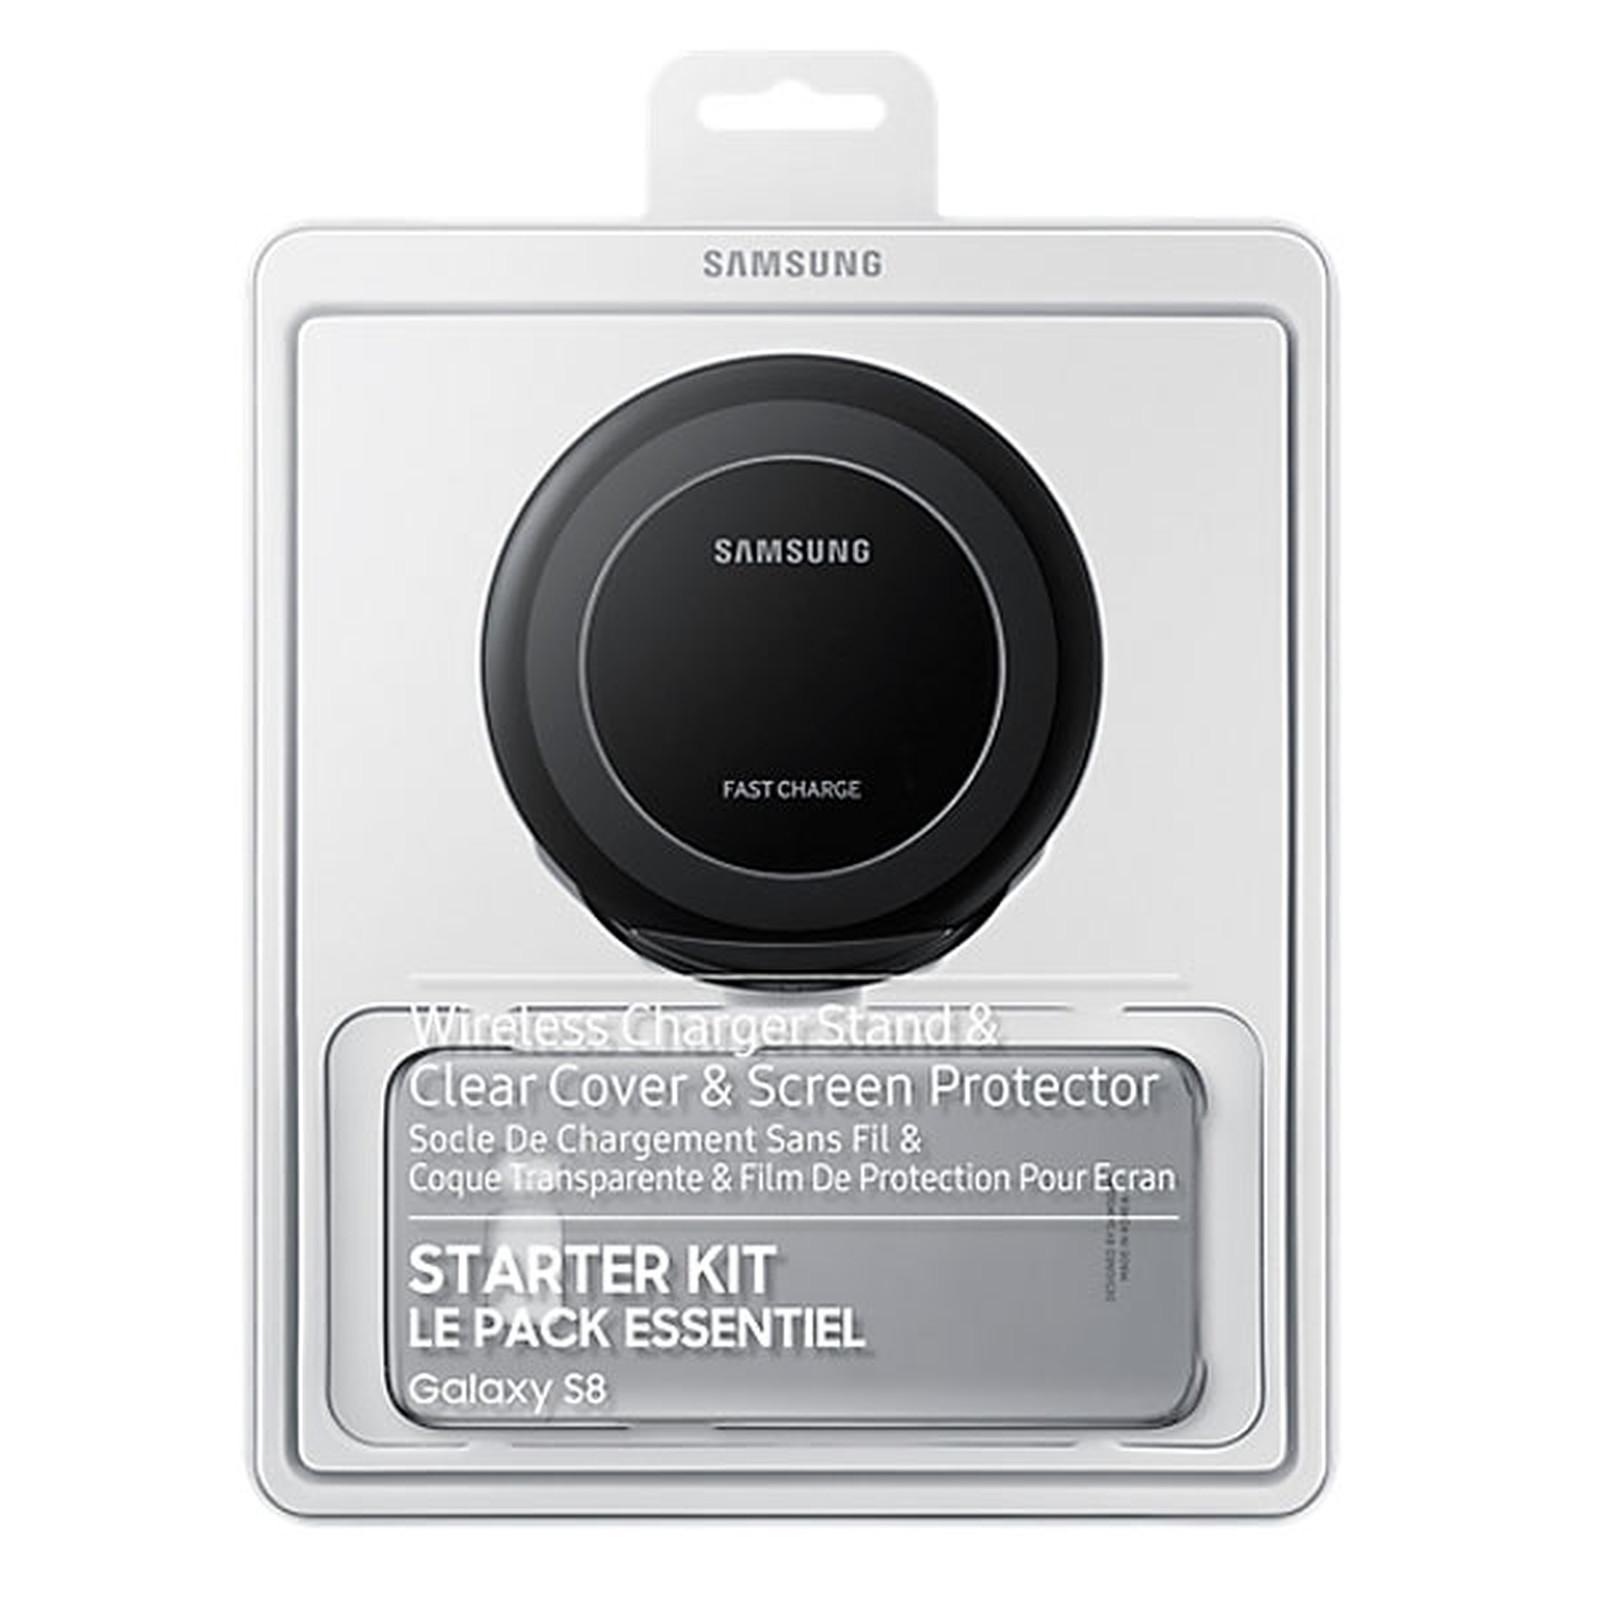 Samsung Coffret Premium Galaxy S8